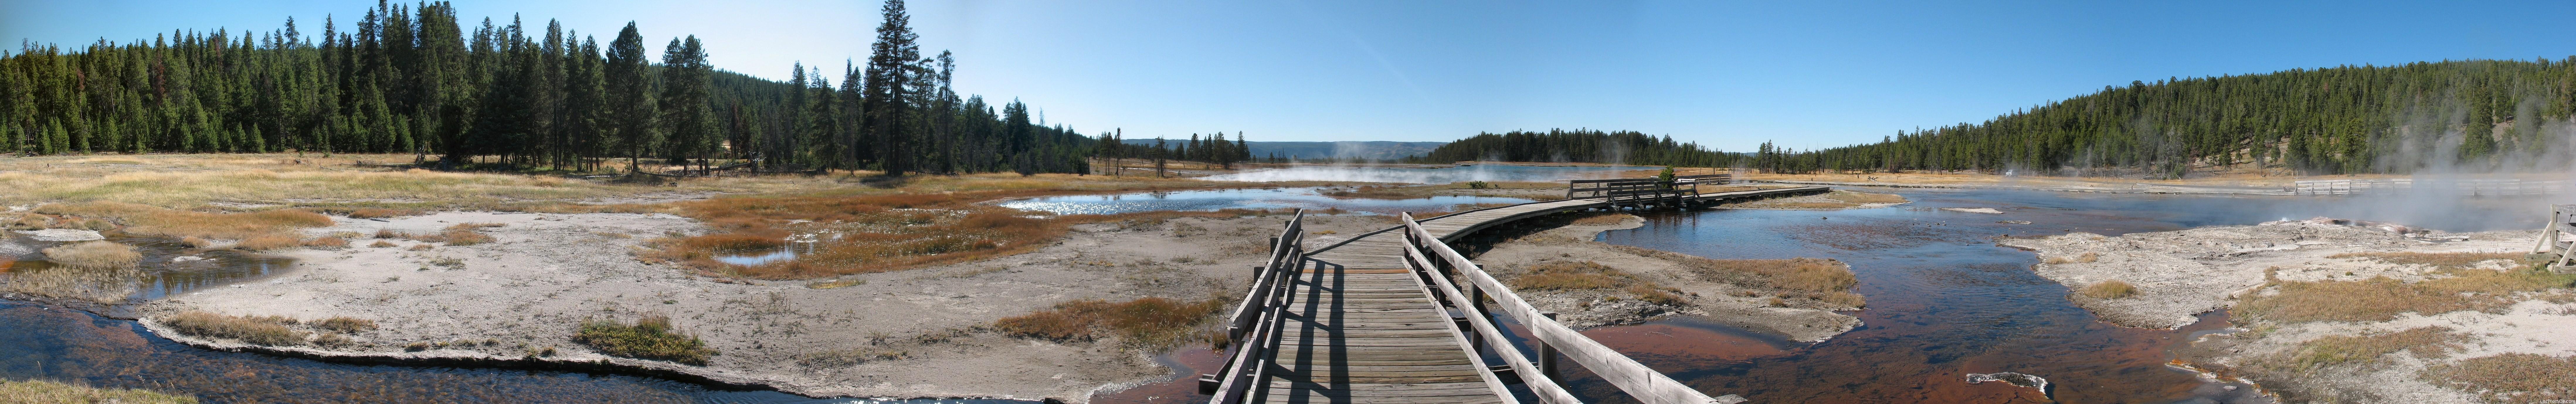 2009 North to Alaska – Day 25